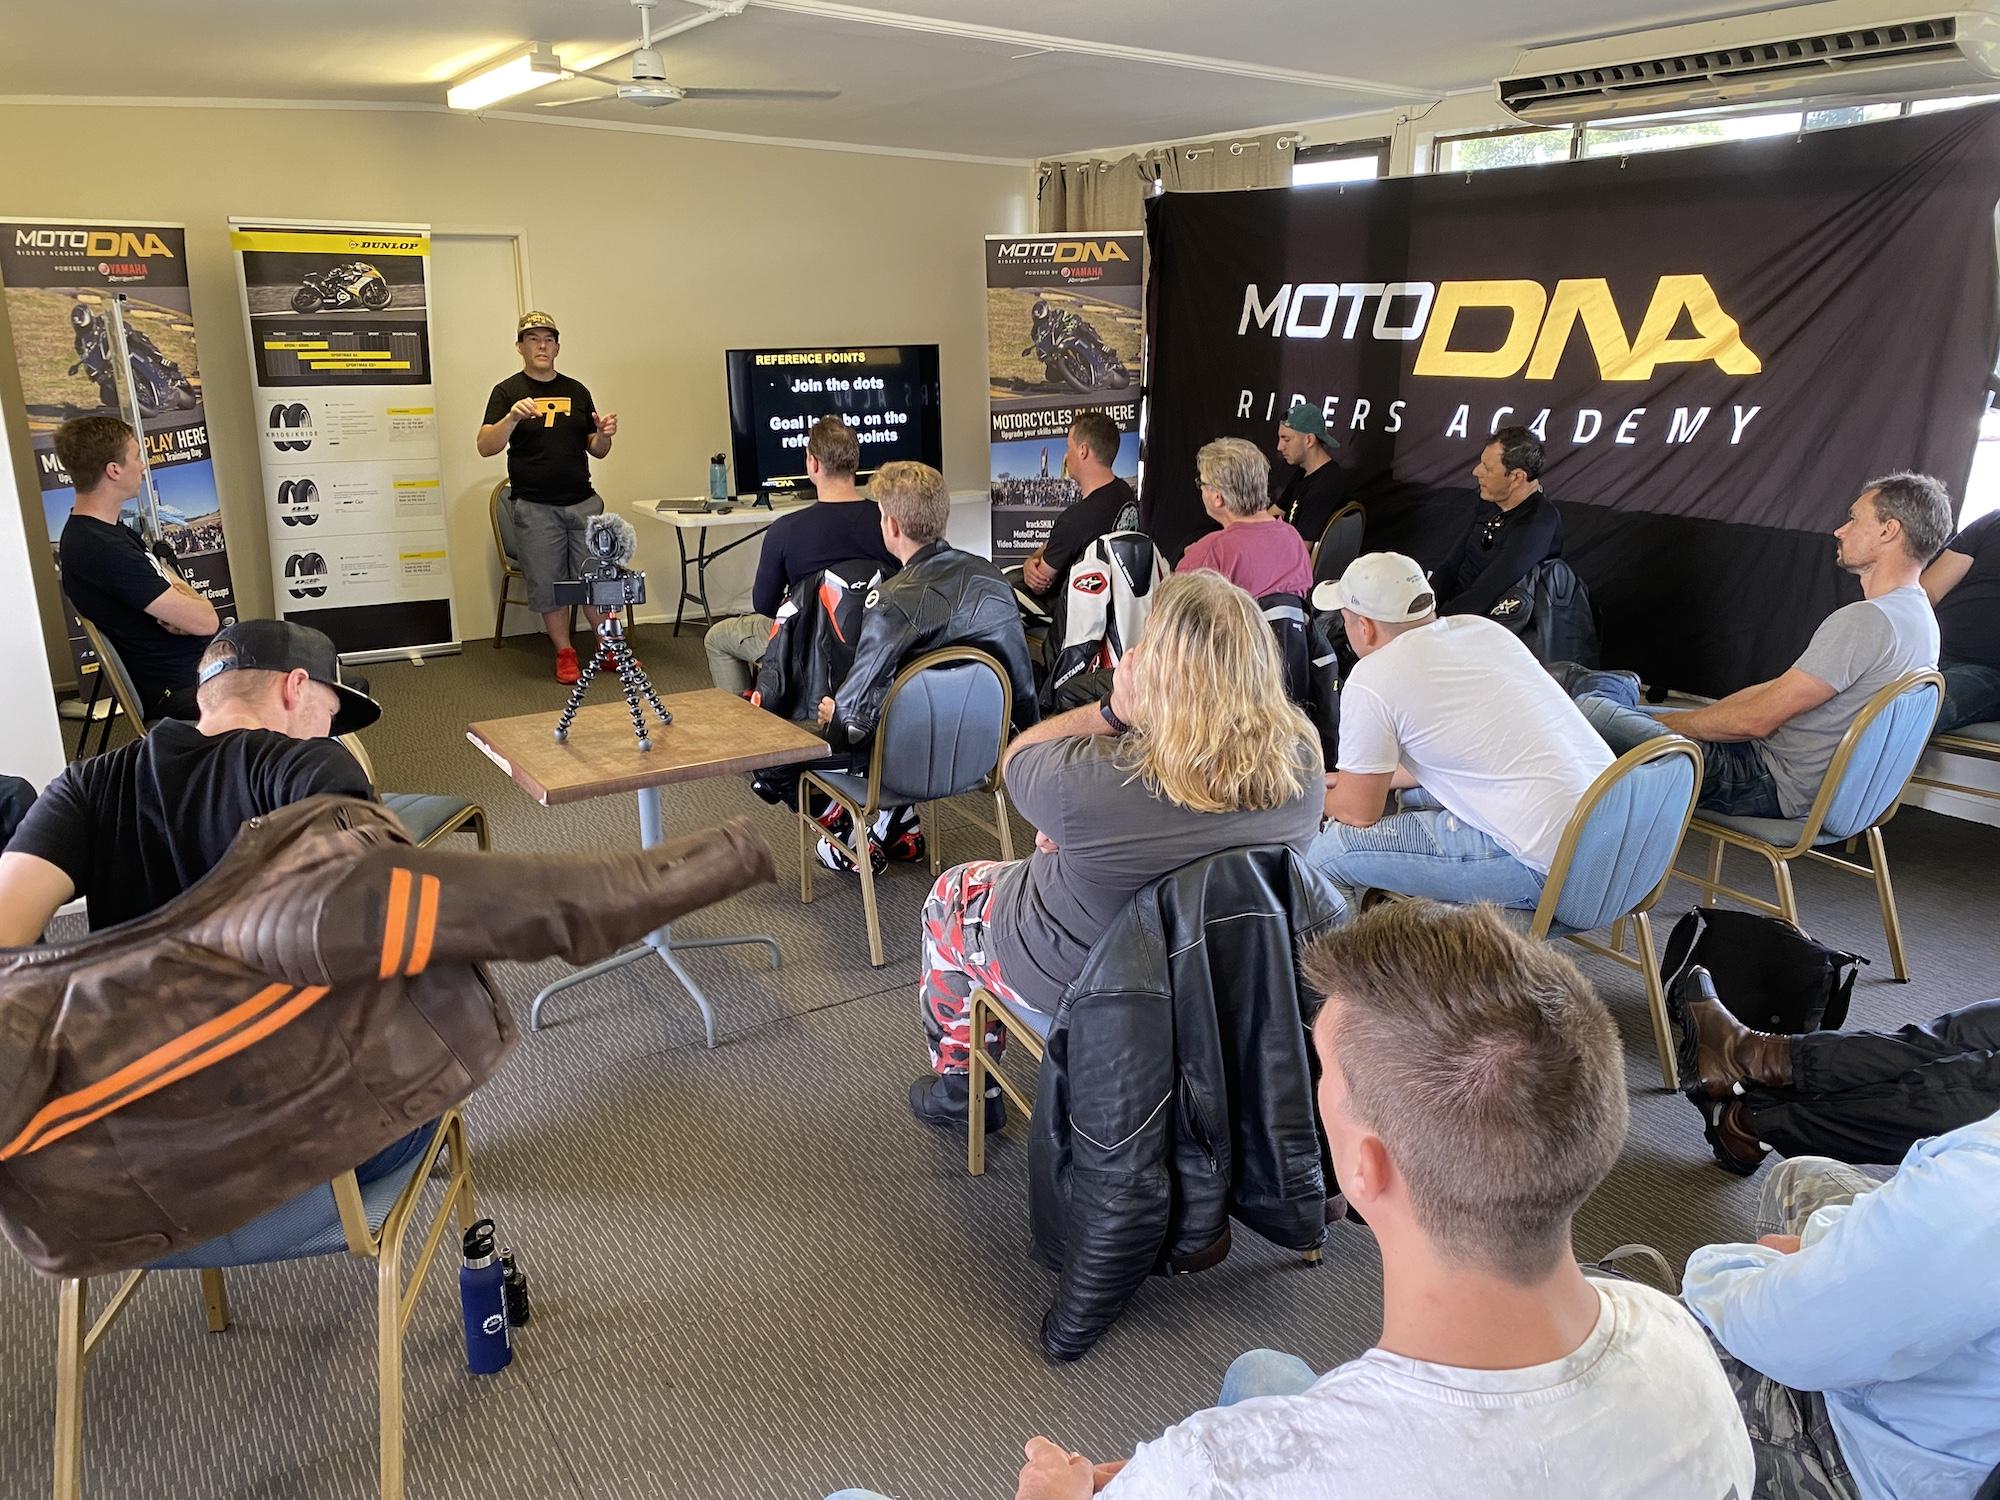 MotoDNA training